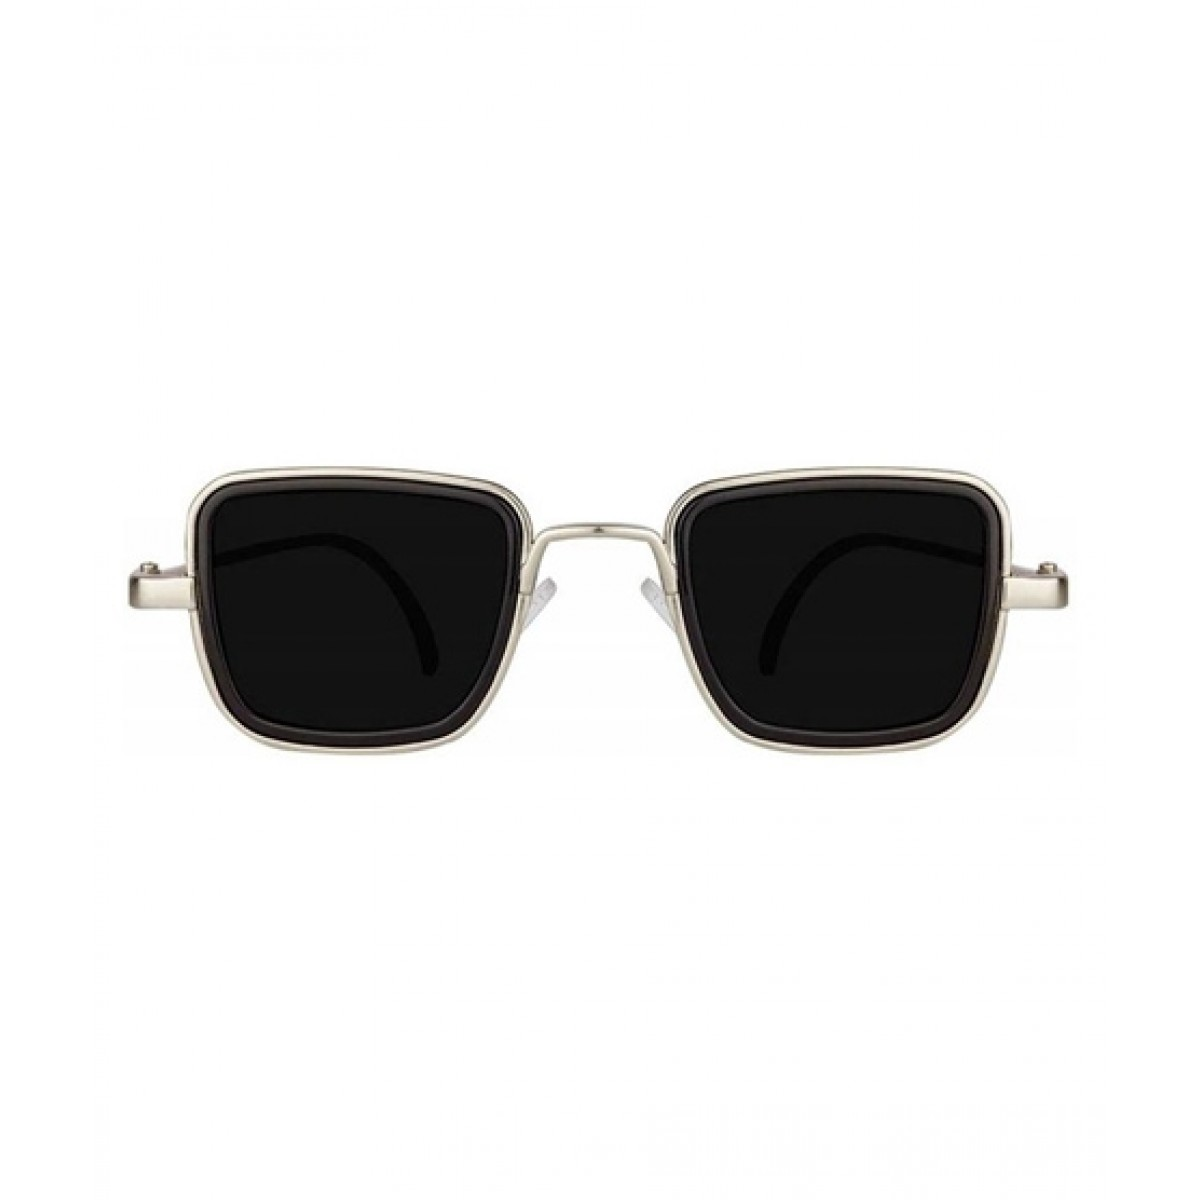 Afreeto Men Square Retro Cool Sunglasses Black